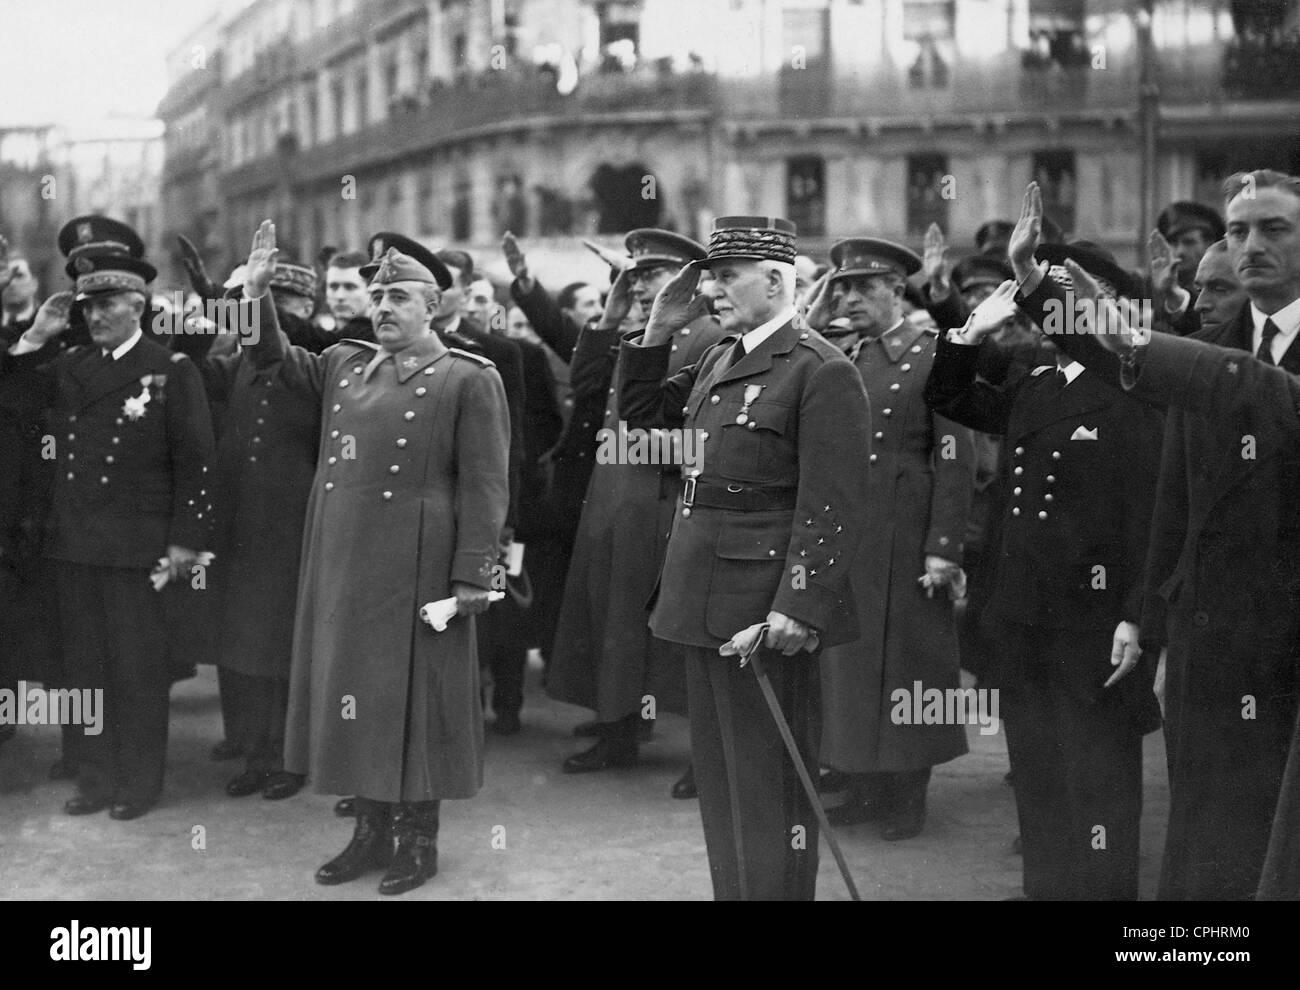 Jean François Darlan, Henri Philippe Pétain, and Francisco Franco, 1941 - Stock Image